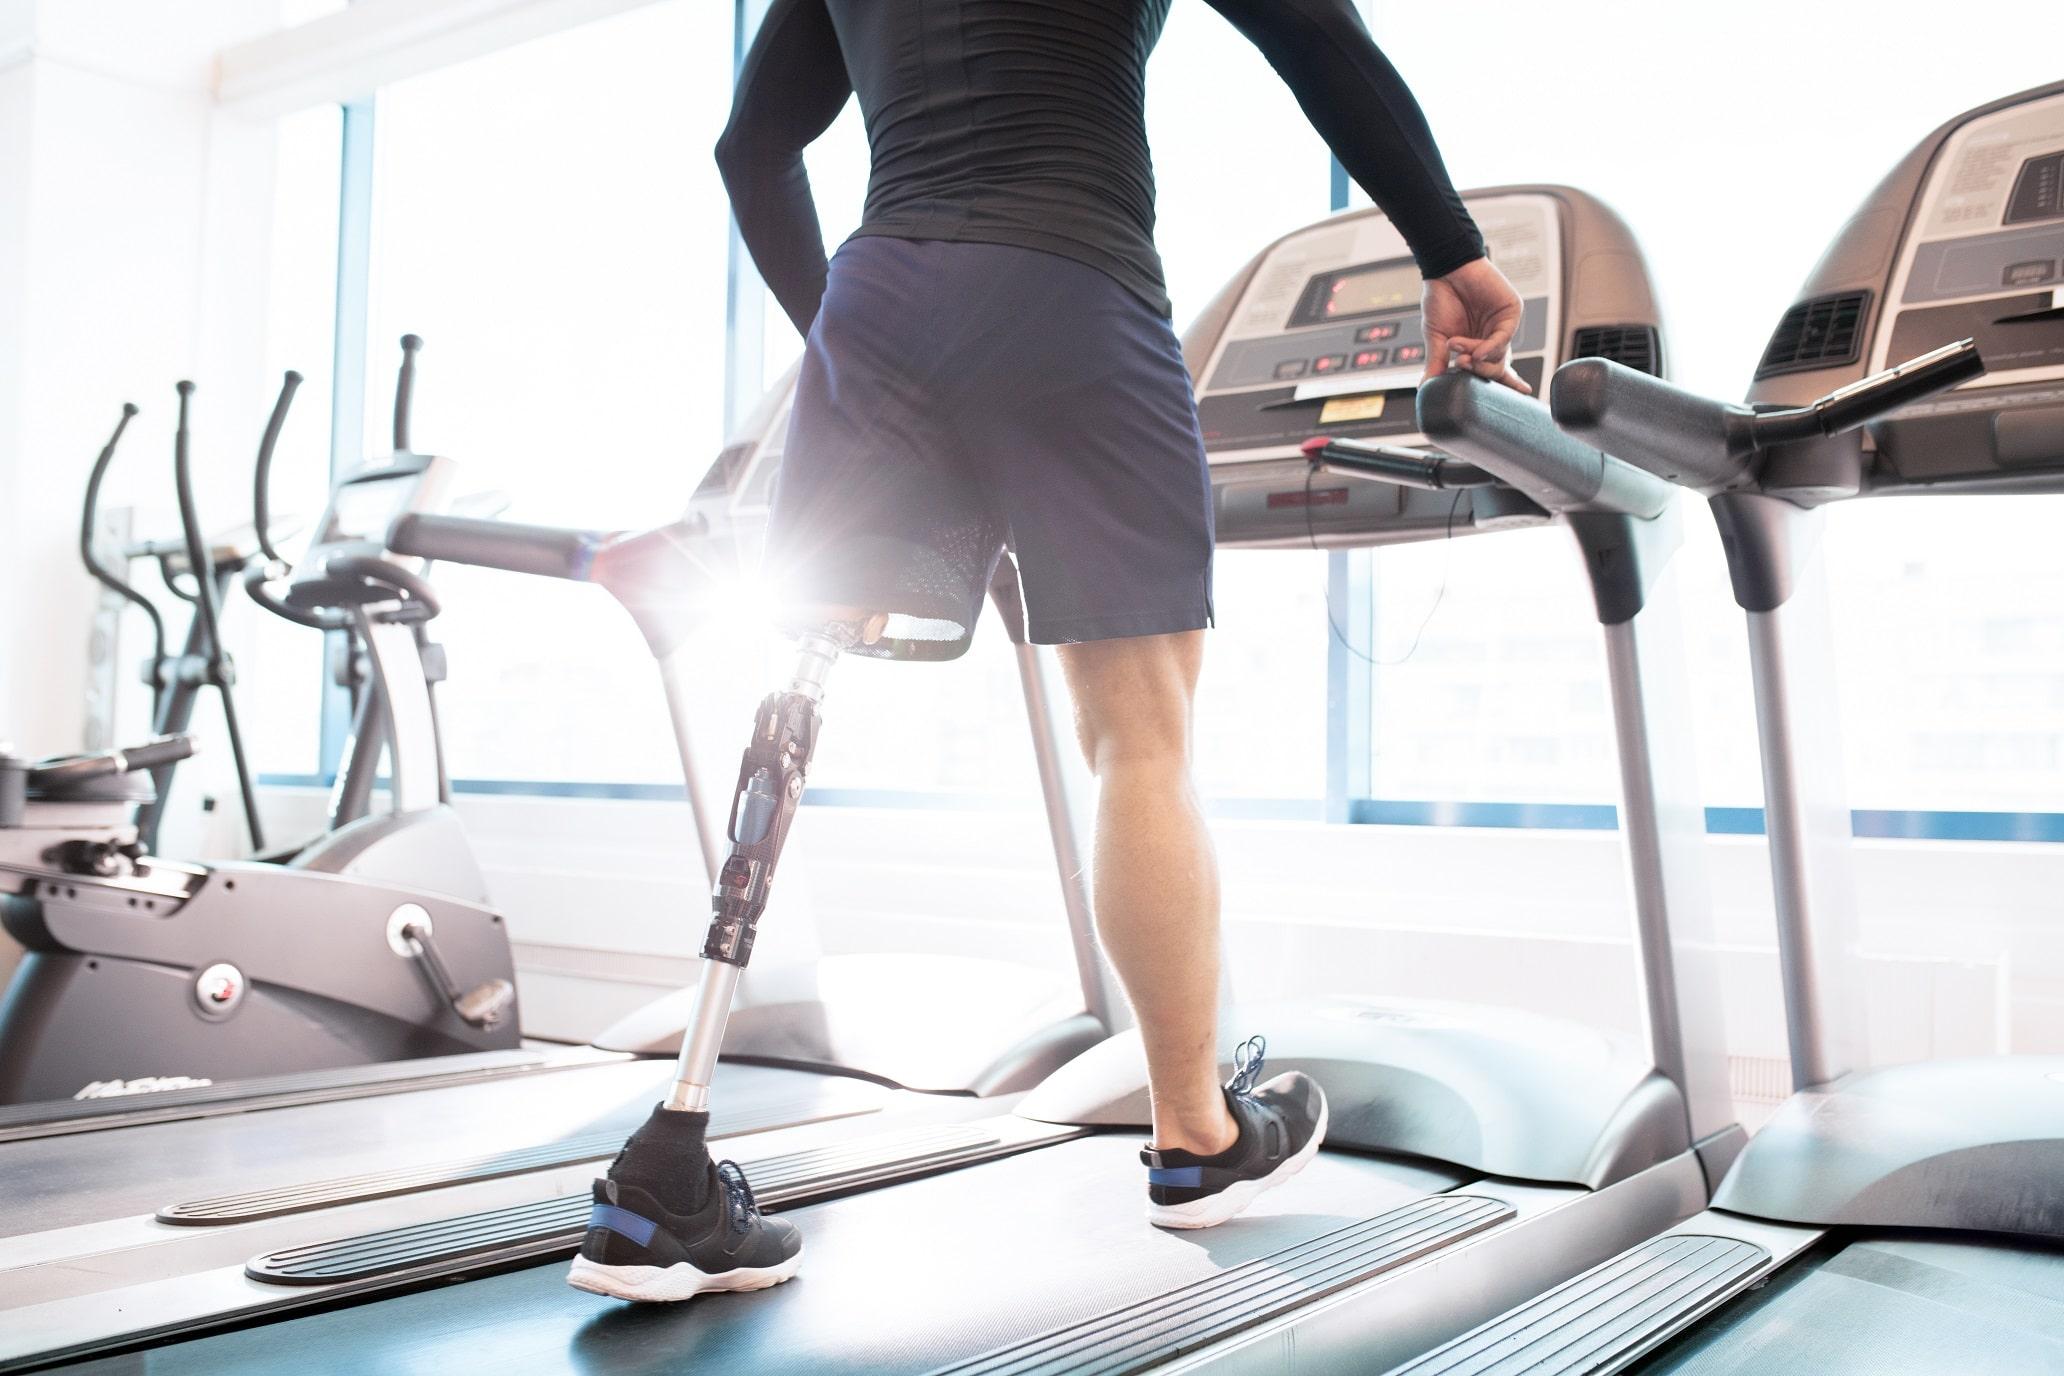 Disabled man on treadmill compensation